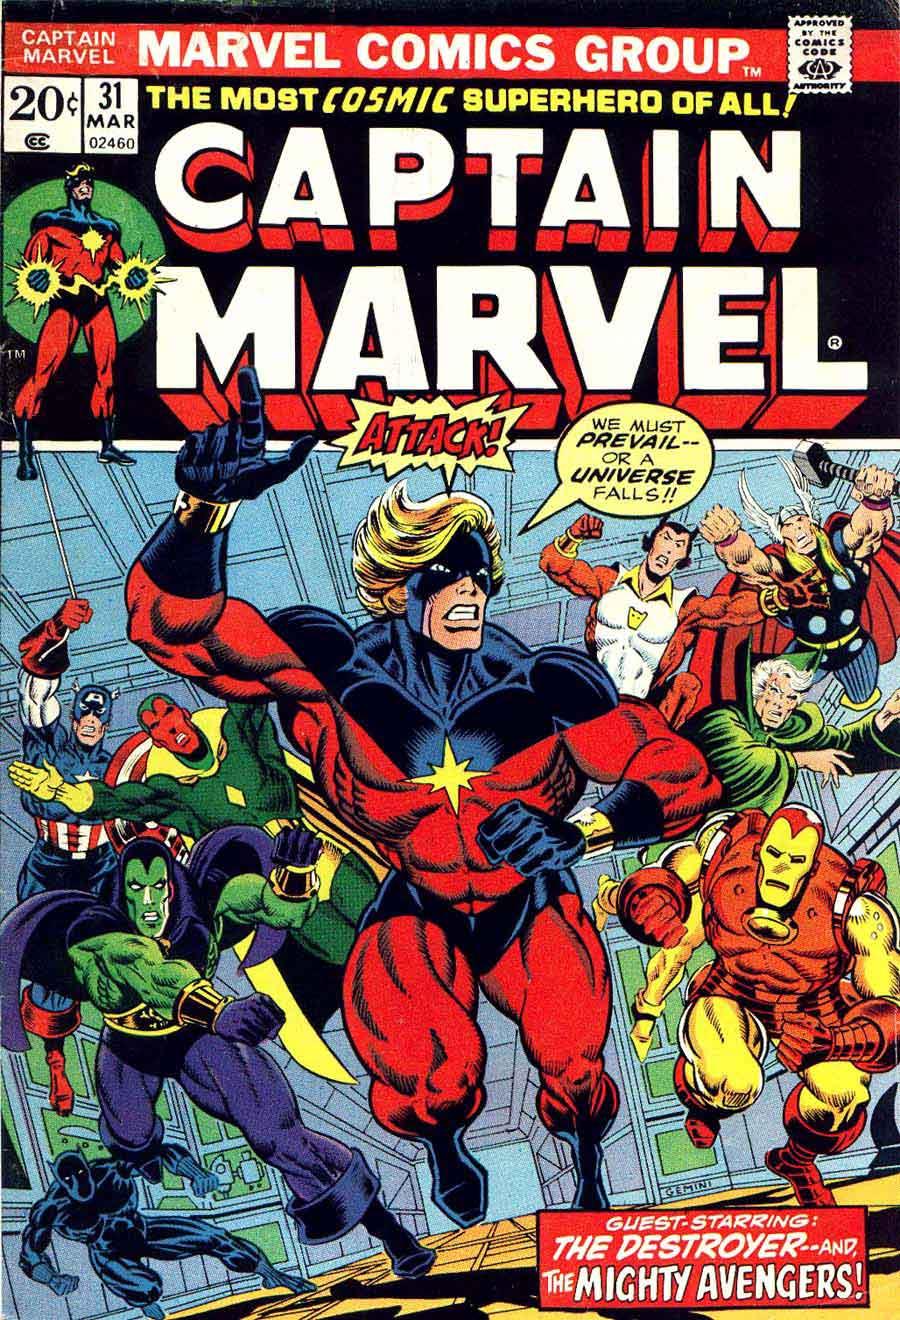 Captain Marvel #31 marvel 1970s bronze age comic book cover art by Jim Starlin